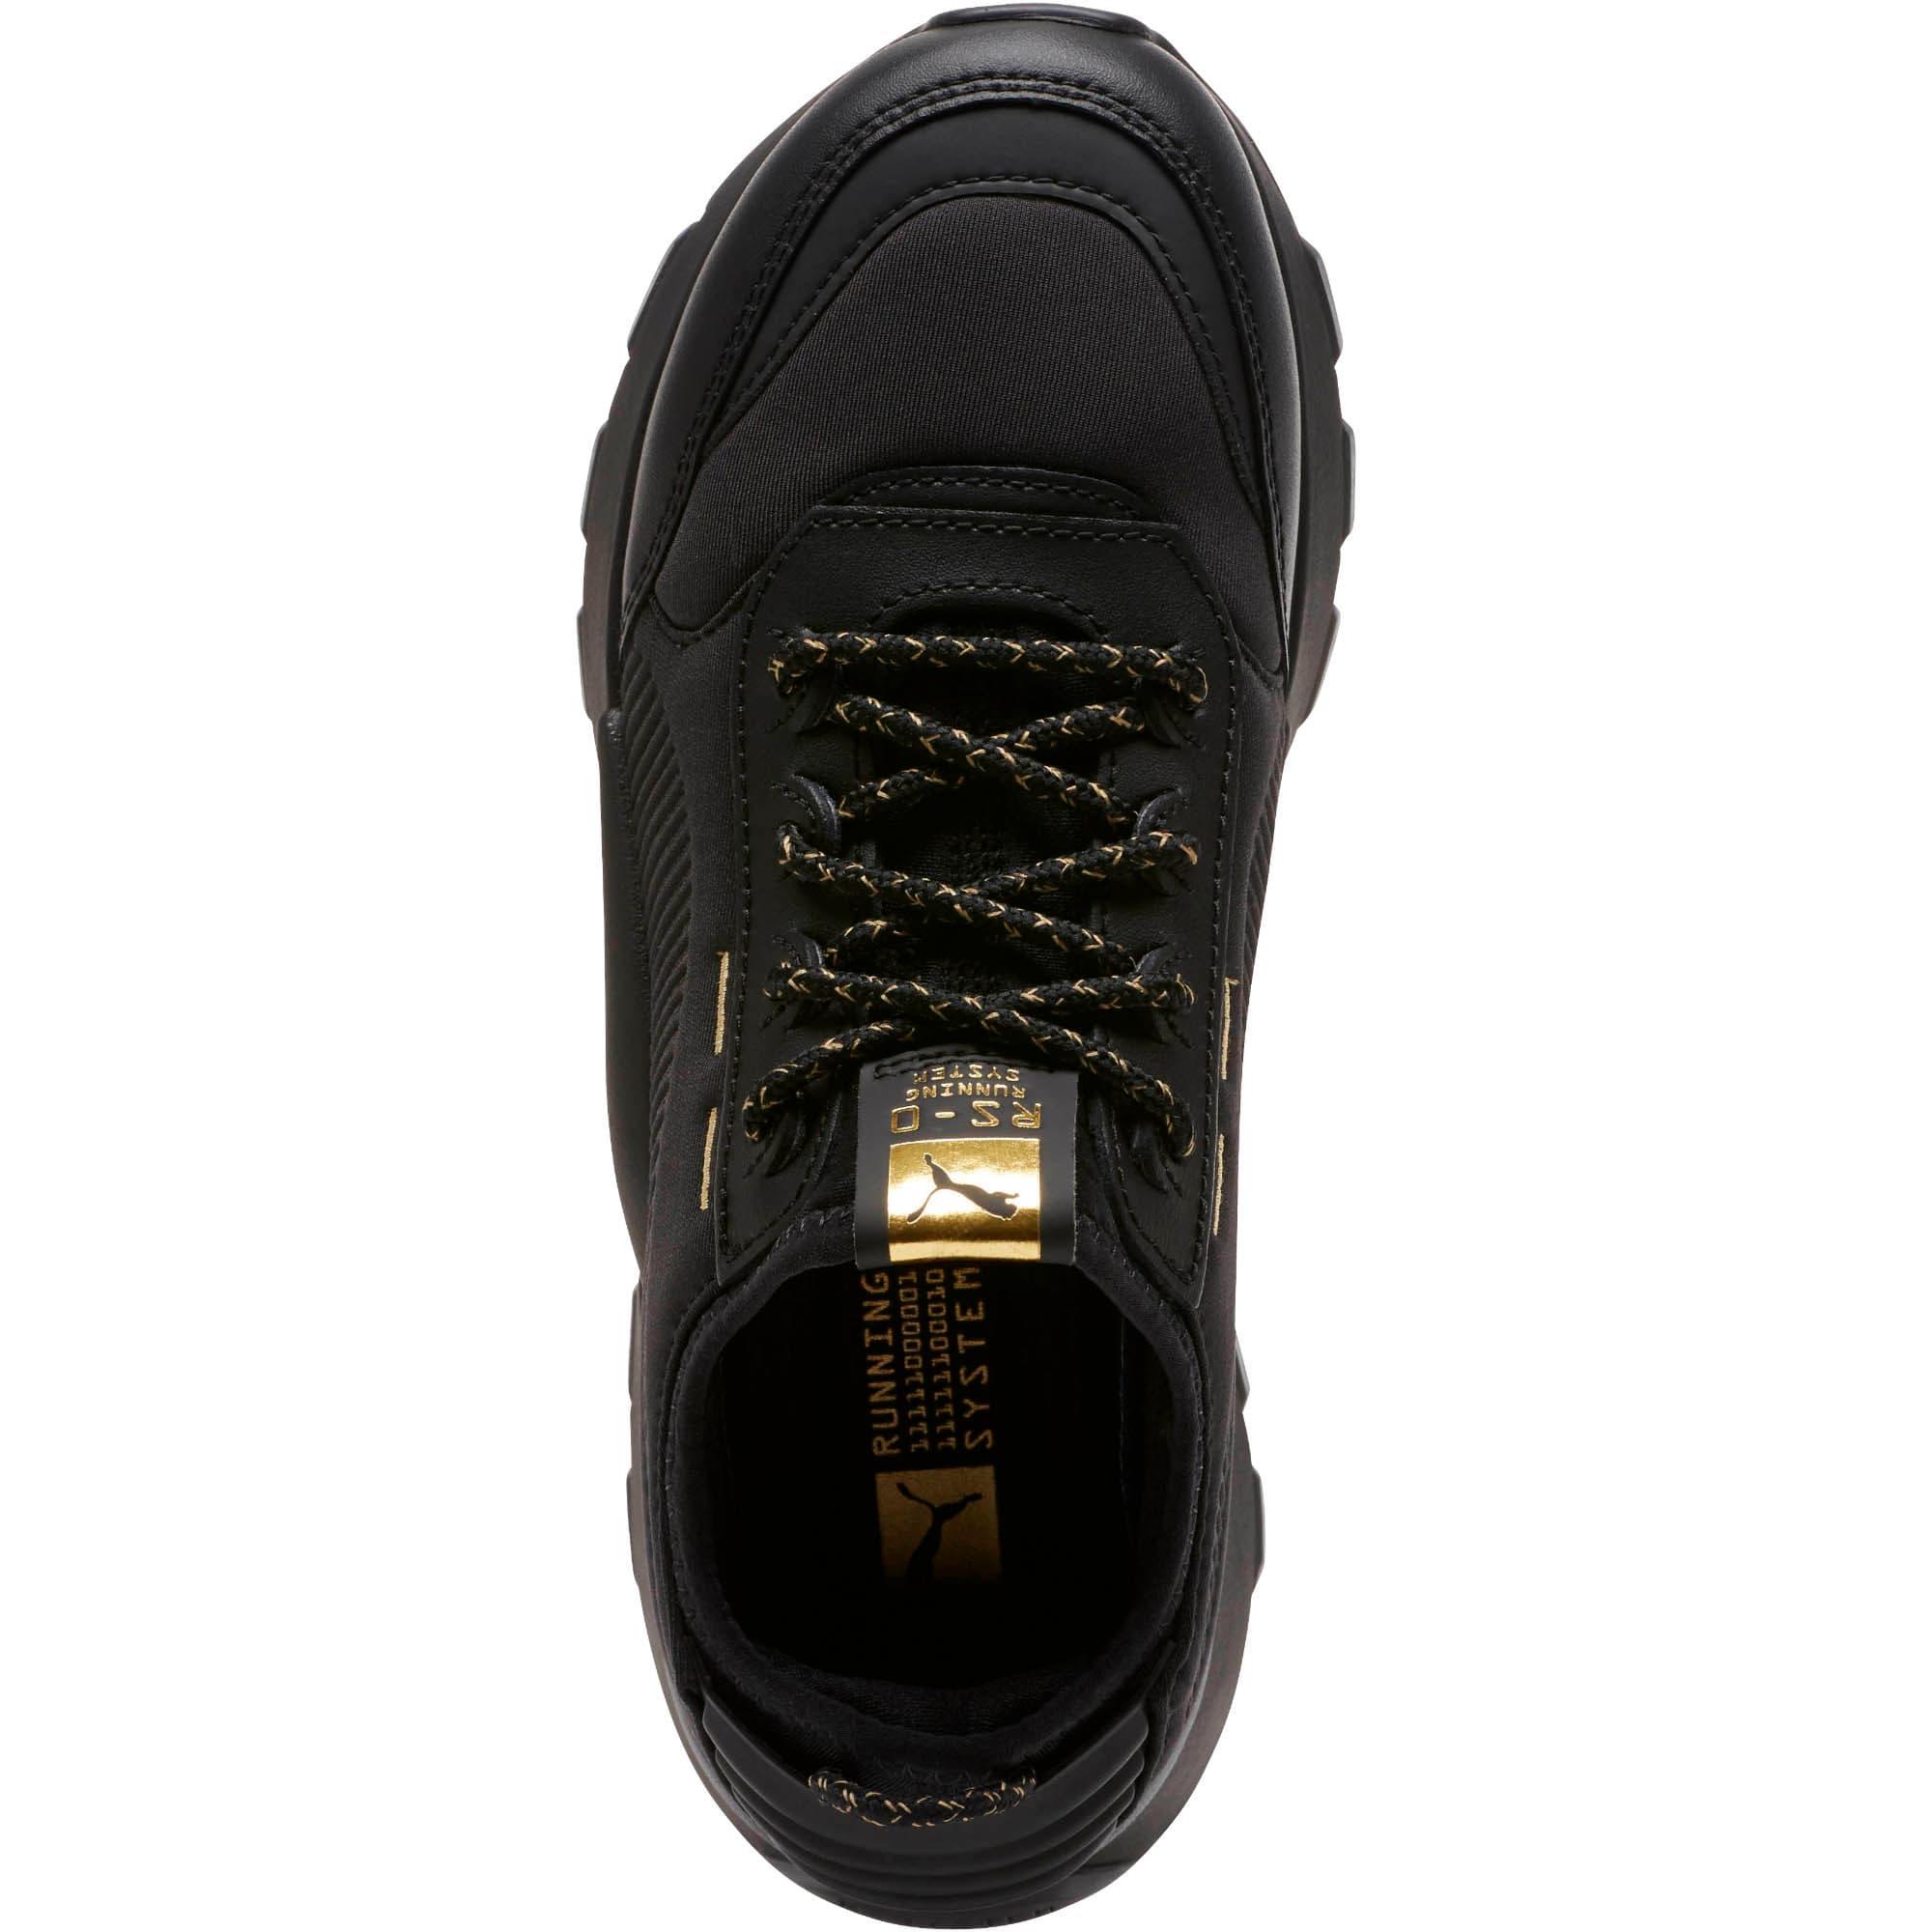 Thumbnail 5 of RS-0 Trophy Sneakers JR, Puma Black-Puma Black, medium